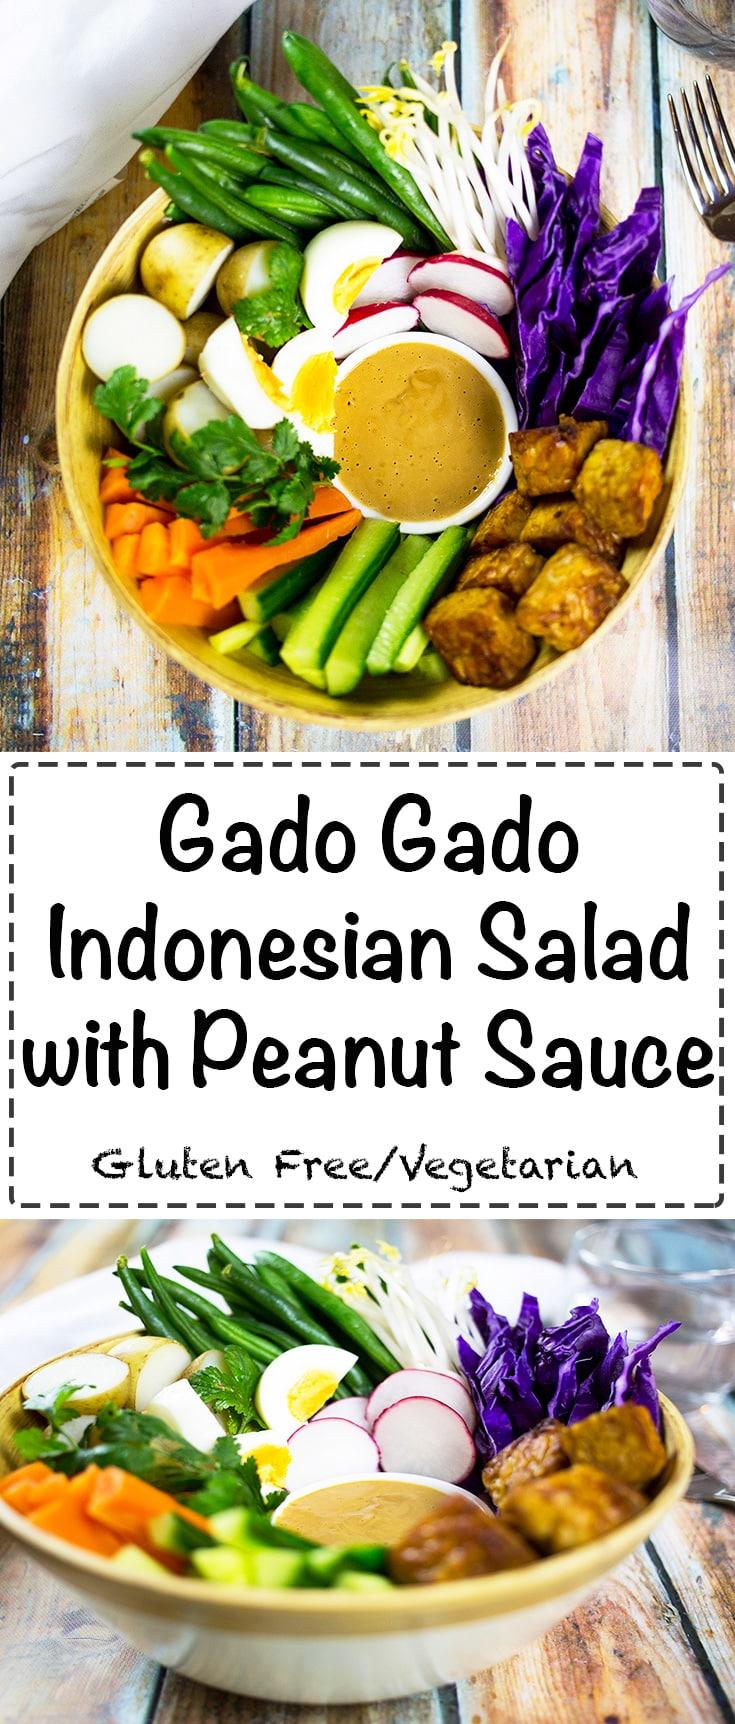 Gado Gado Indonesian Salad with peanut sauce. A healthy and tasty vegetarian salad.#glutenfree #vegetarian #glutenfreemain